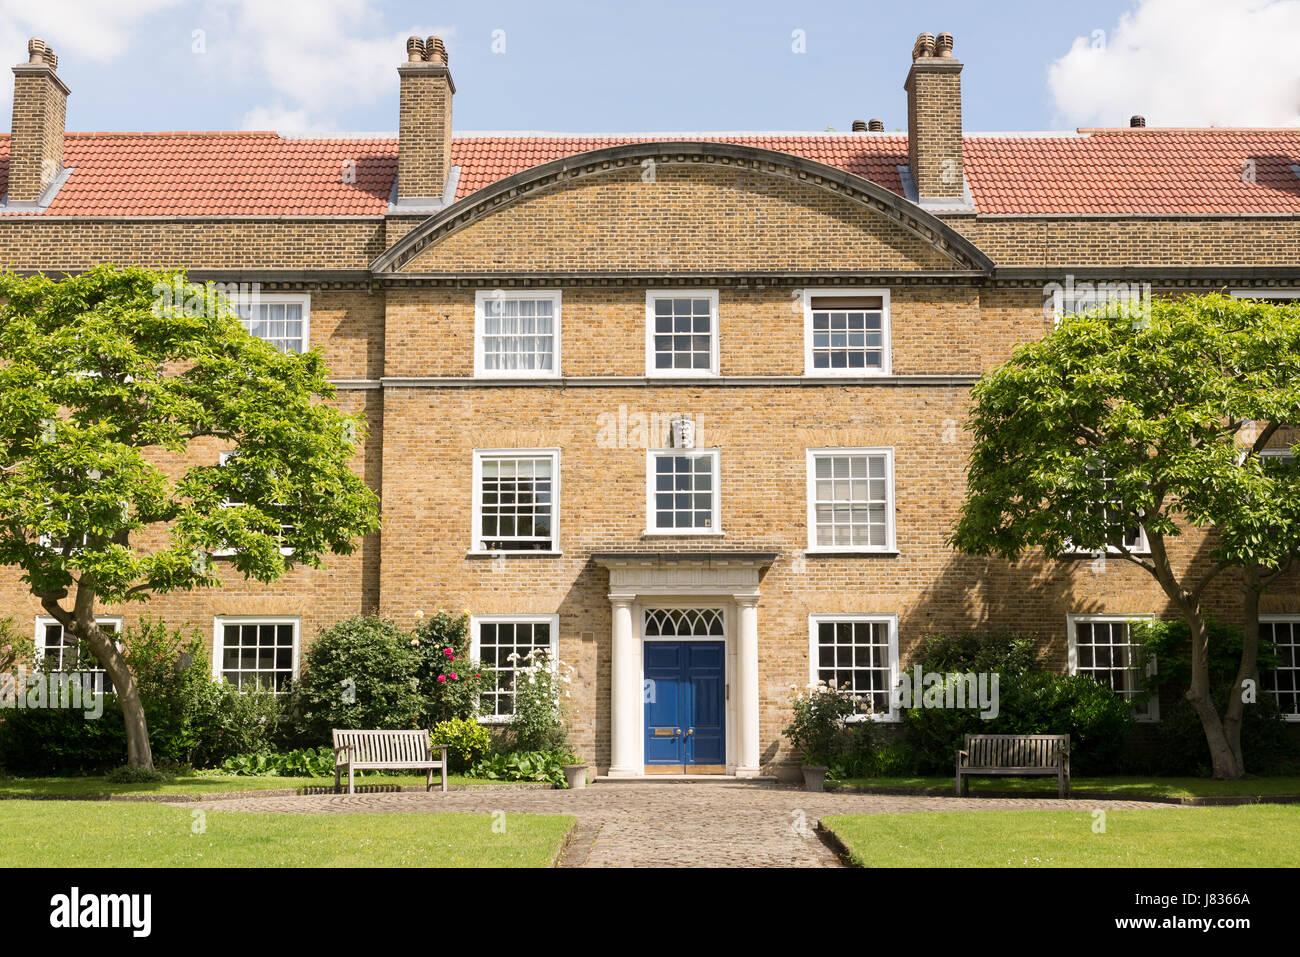 Fachada exterior de una mansi n georgiana brit nica for Fachada de la casa clasica